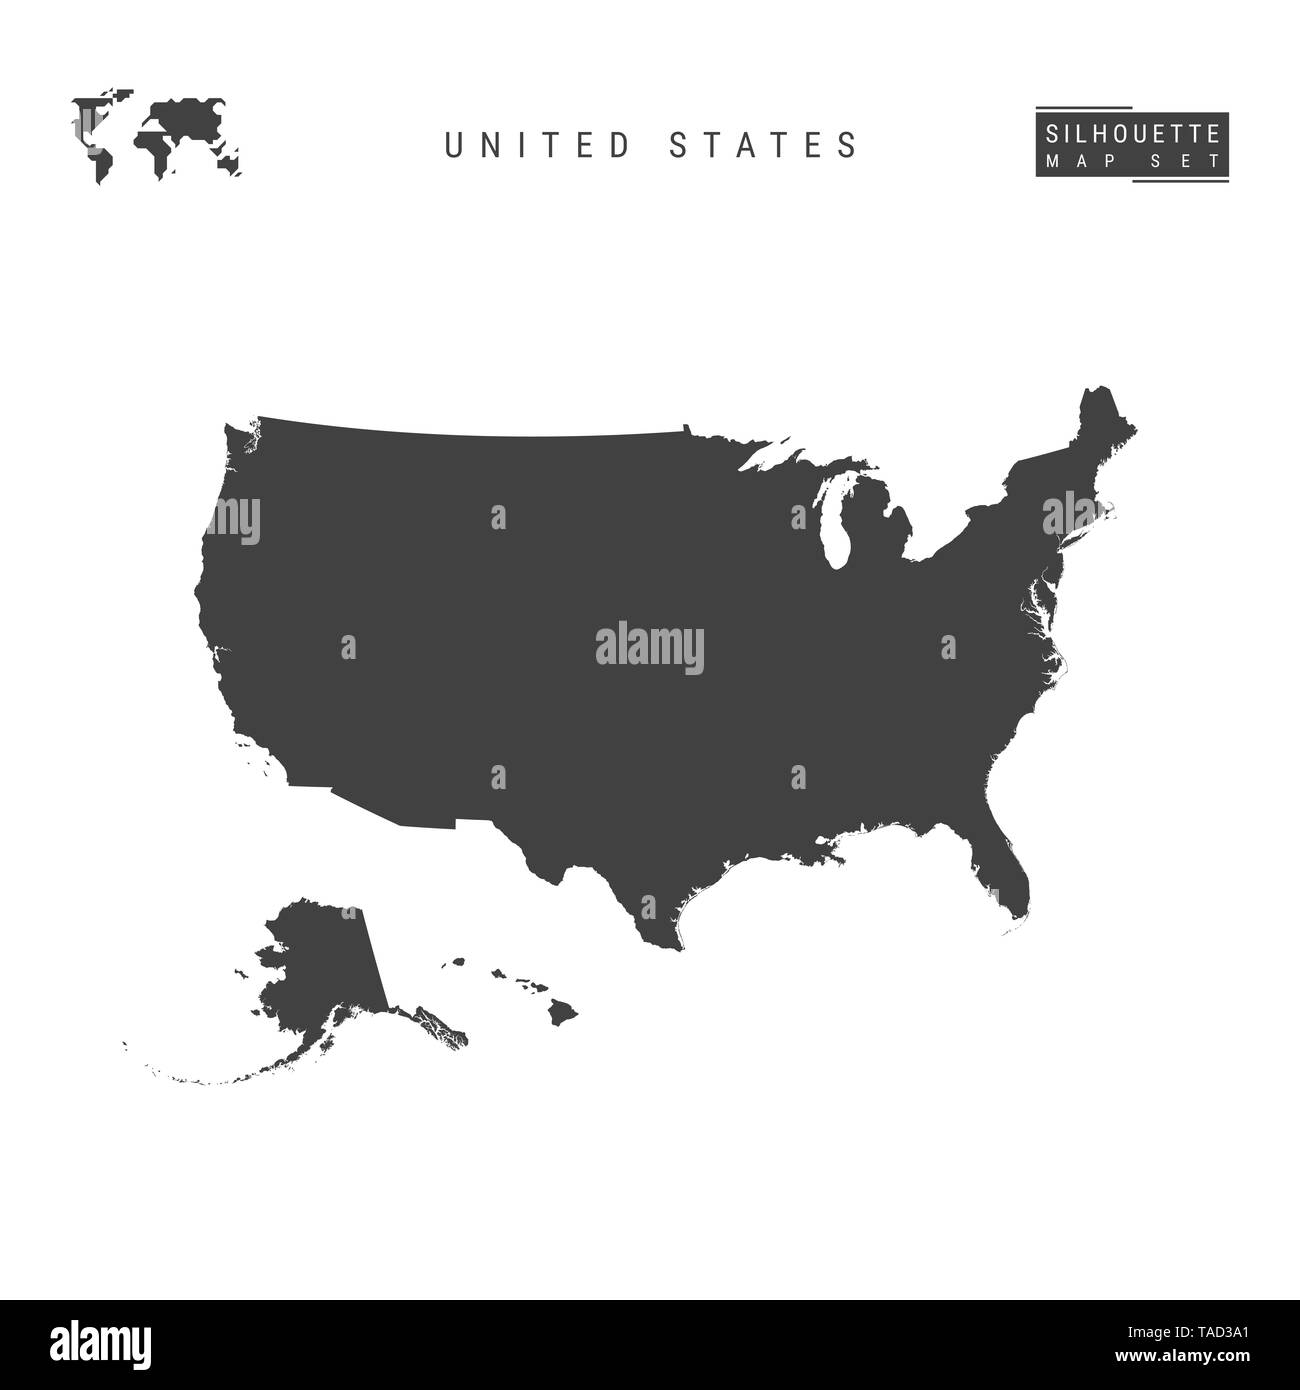 United States Blank Map Isolated on White Background. High ...